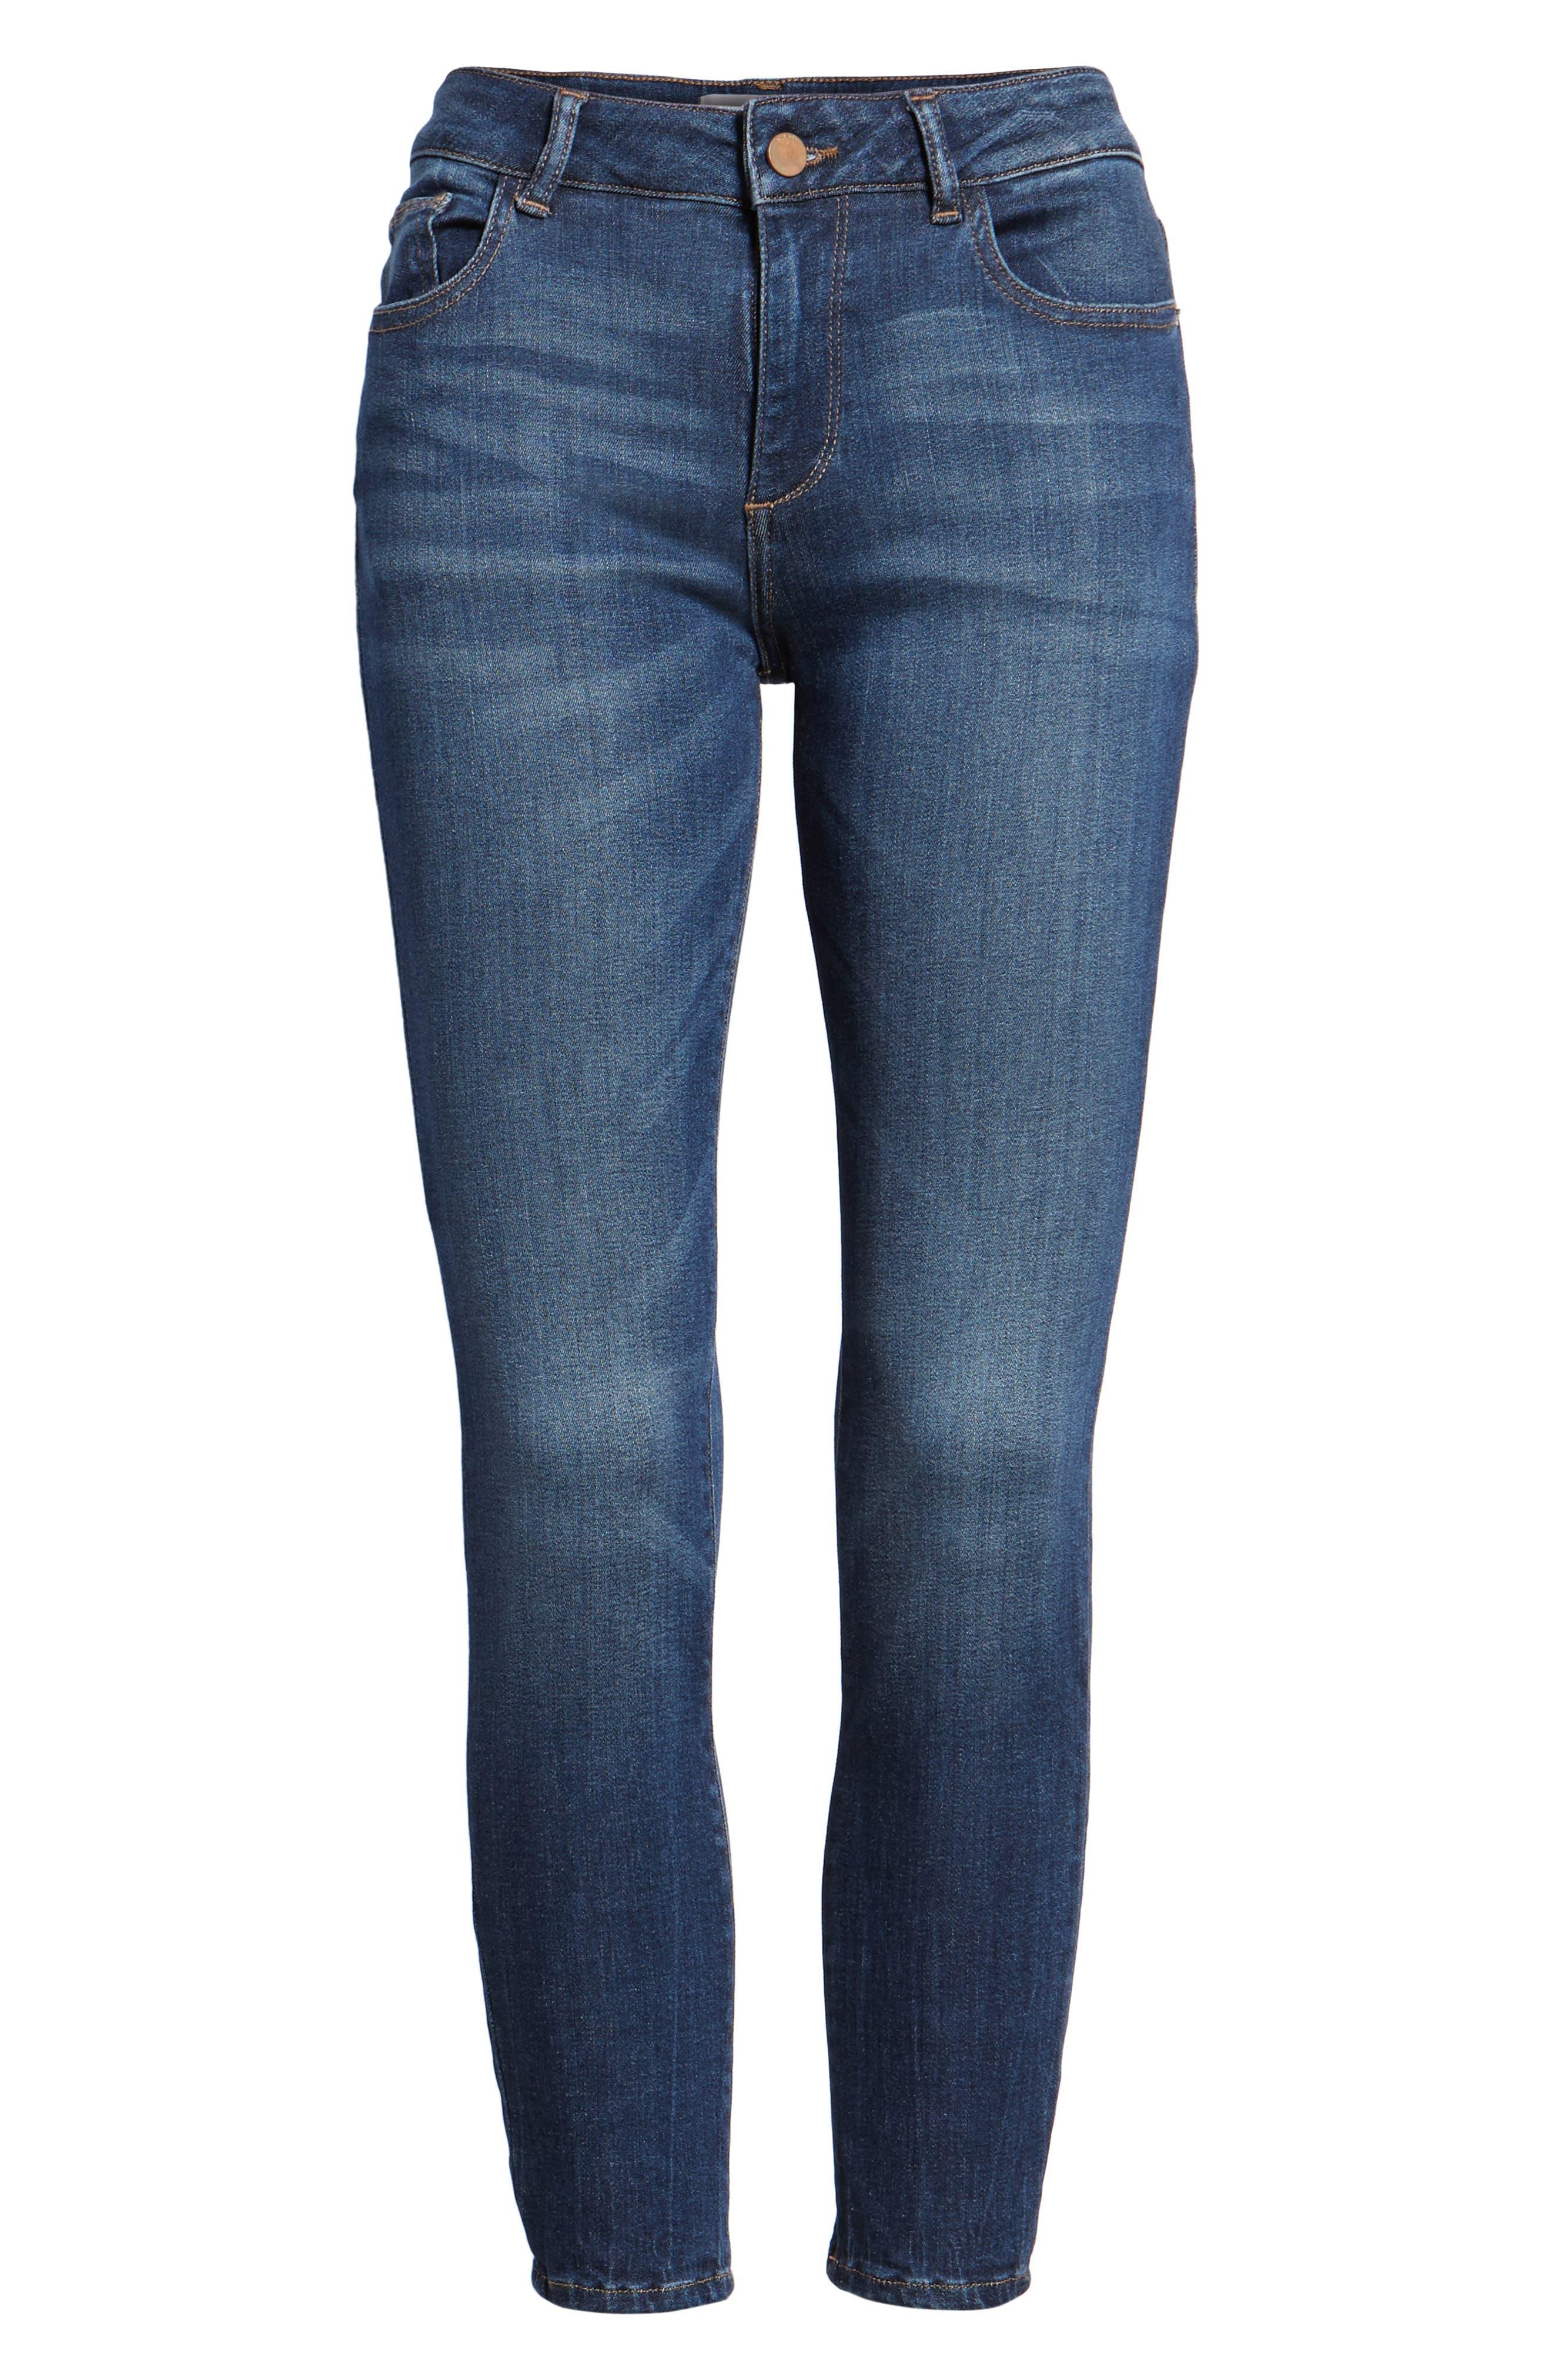 Florence Instasculpt Crop Skinny Jeans,                             Alternate thumbnail 7, color,                             405